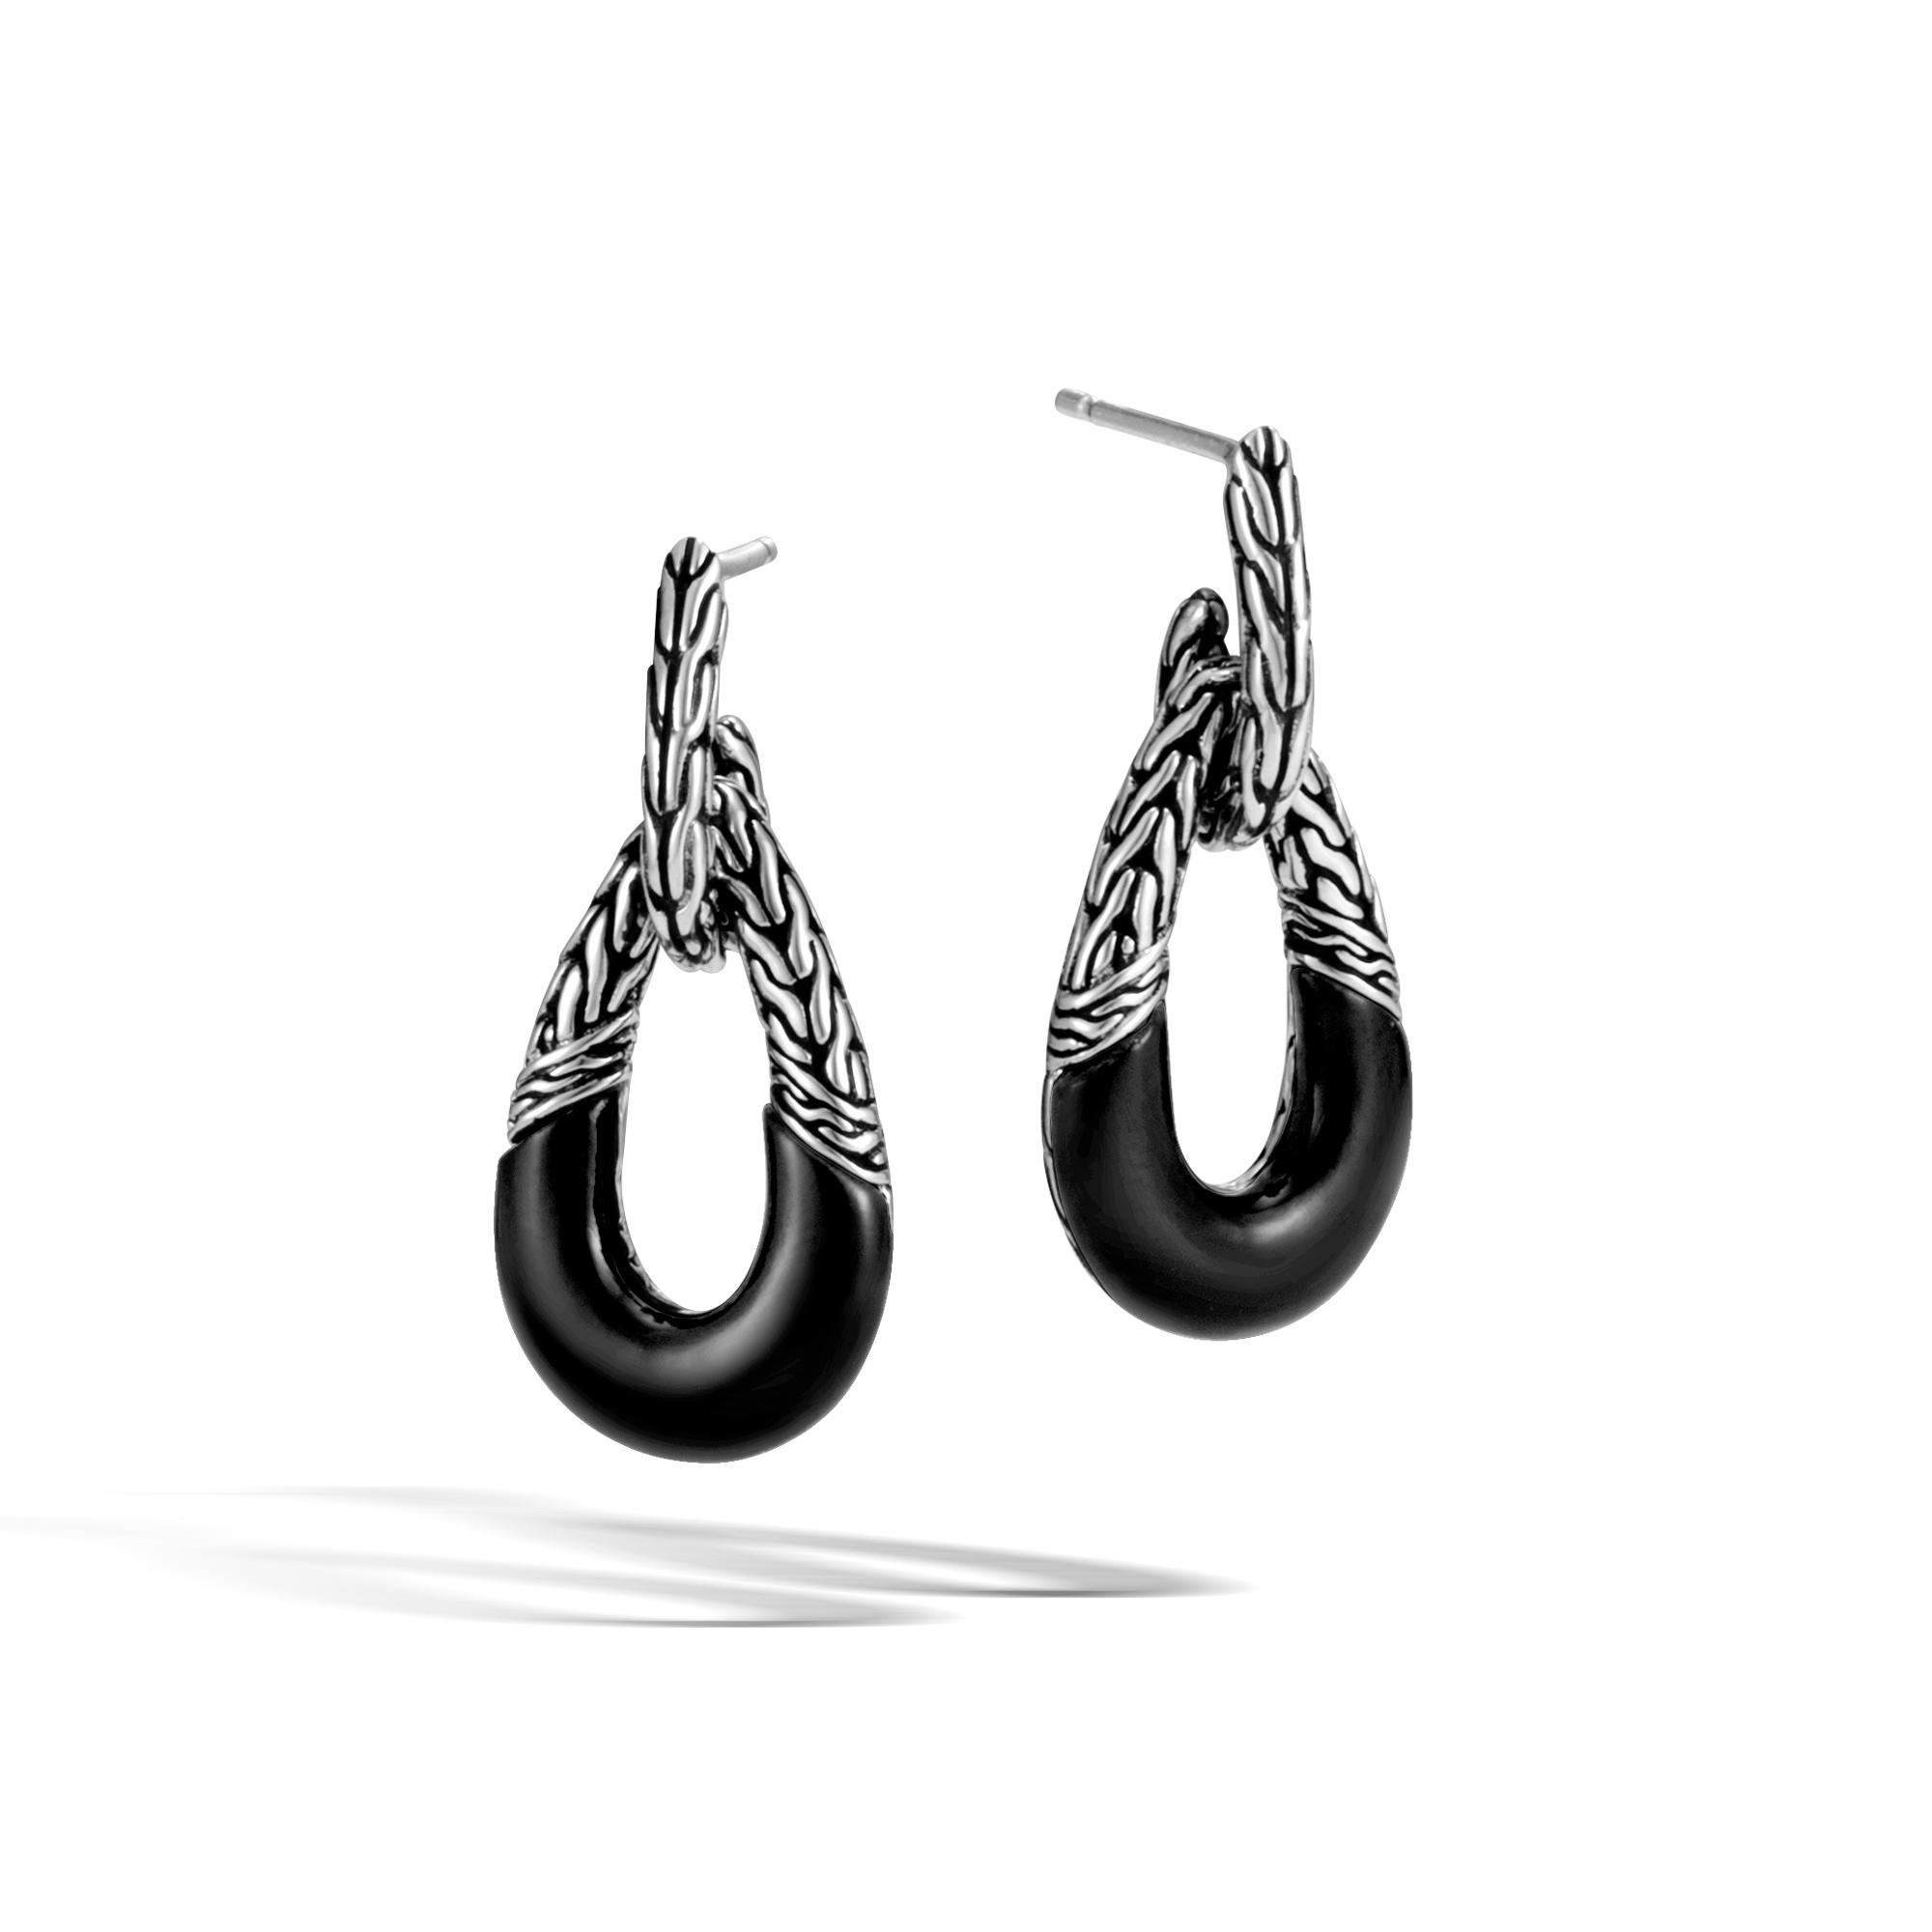 John Hardy Classic Chain Hoop Earring With Onyx Black onyx 6bpZGIe